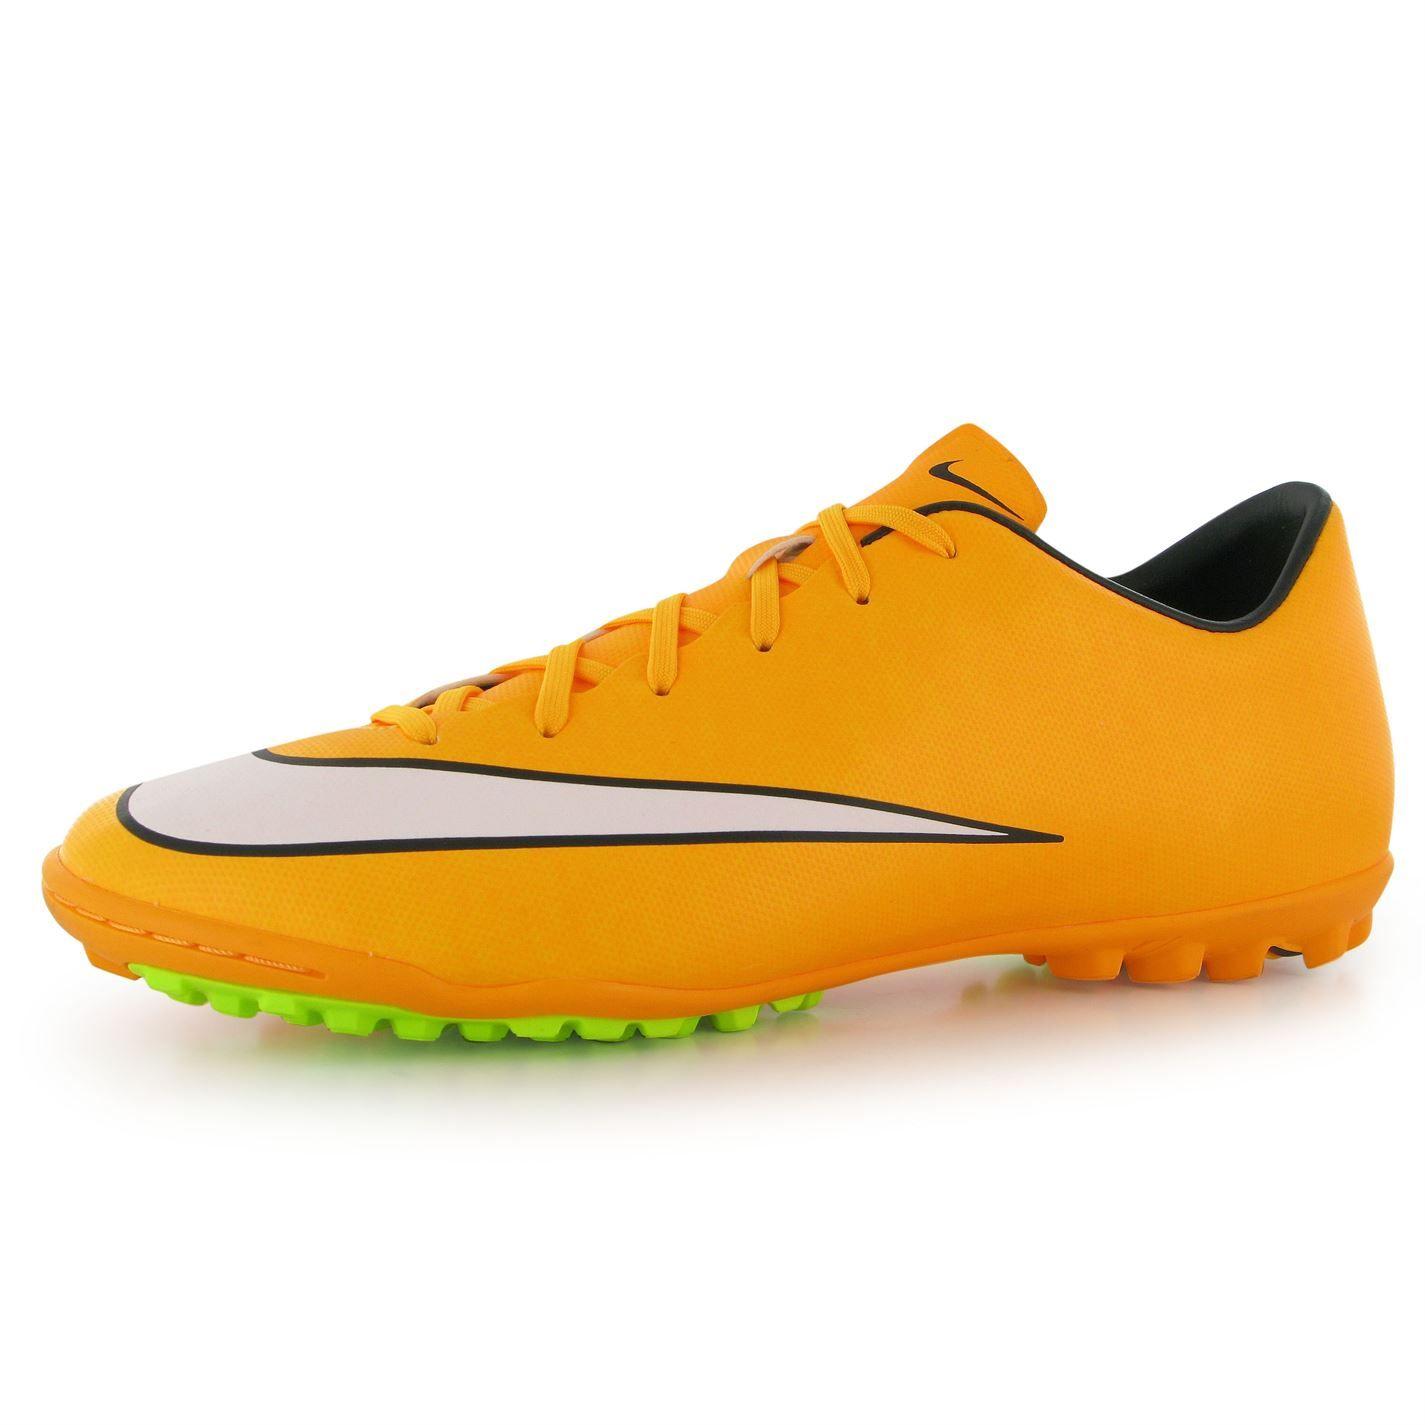 980bae0390 Nike | Nike Mercurial Victory Childrens Astro Turf Trainers | Kids Nike  Mercurial Vapor Football Boo